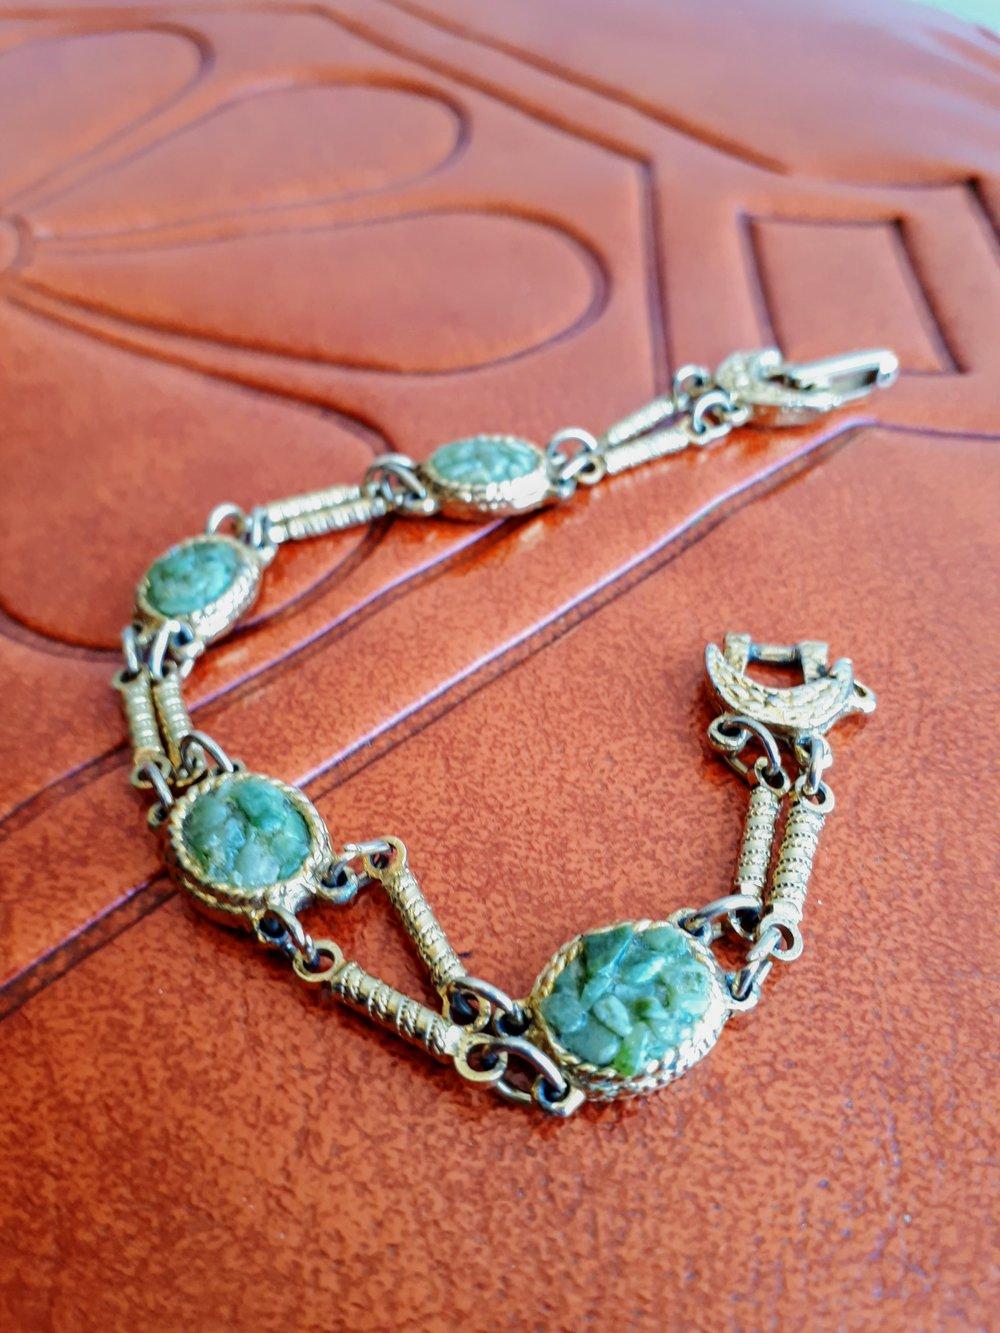 Bracelet, $18